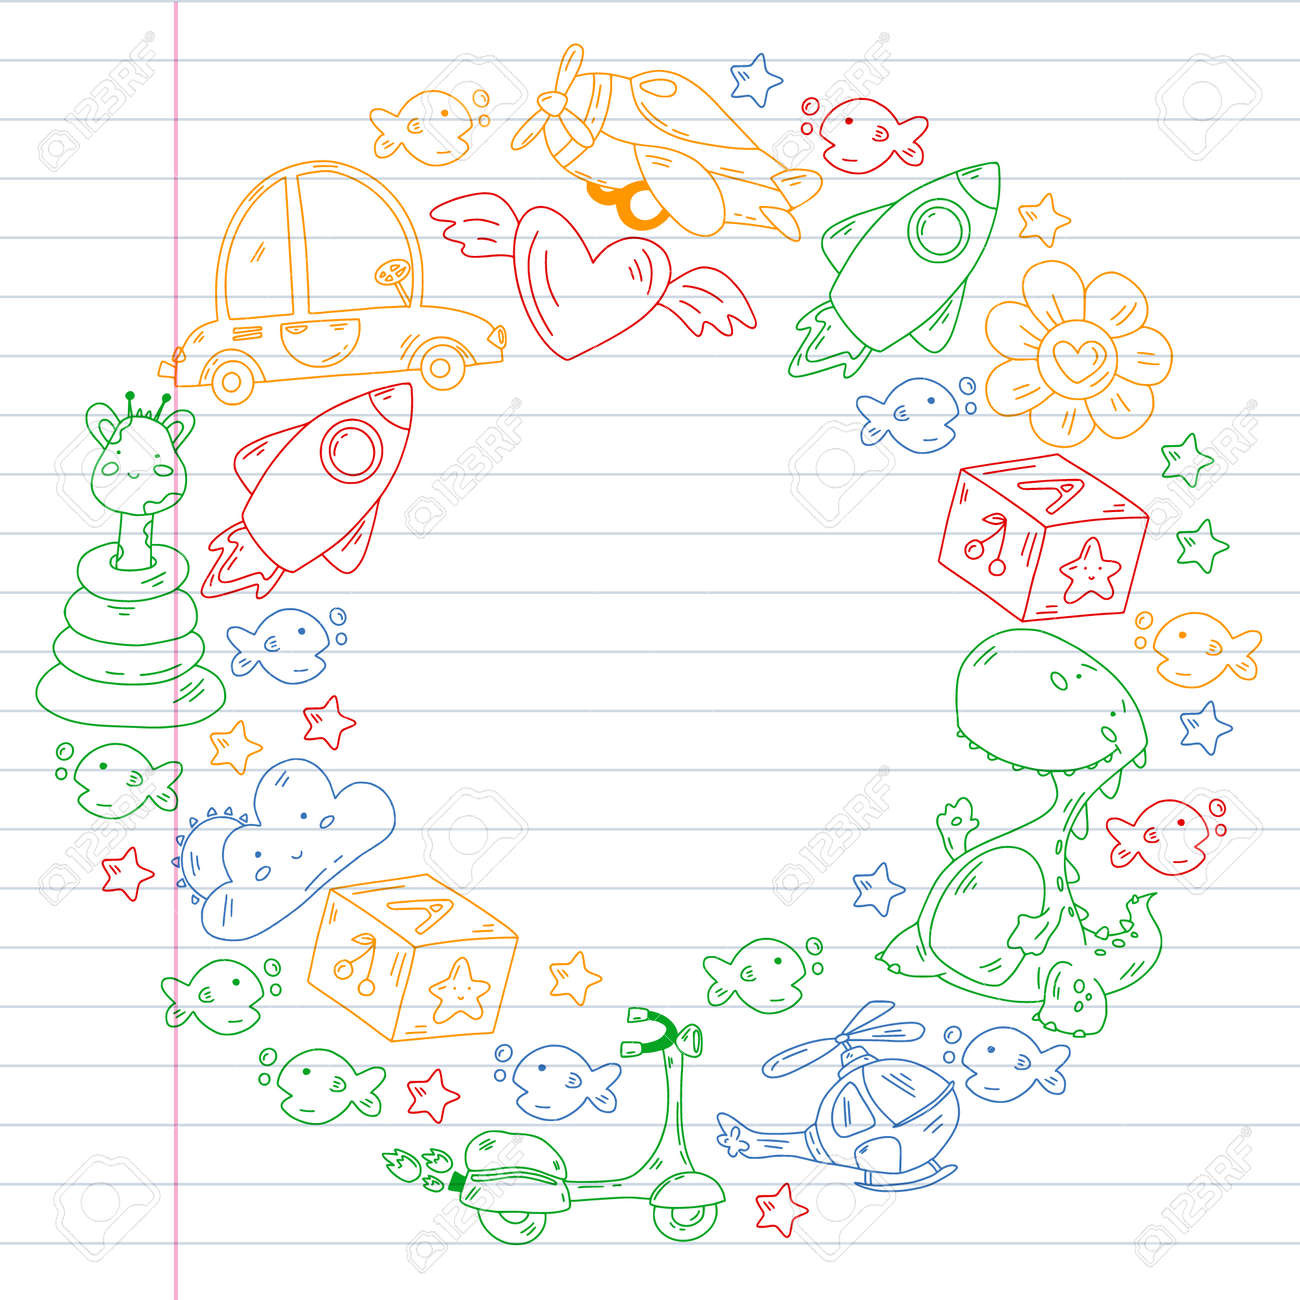 Children play with toys in the kindergarten. Kids playground. Education, creativity, imagination. - 173370427